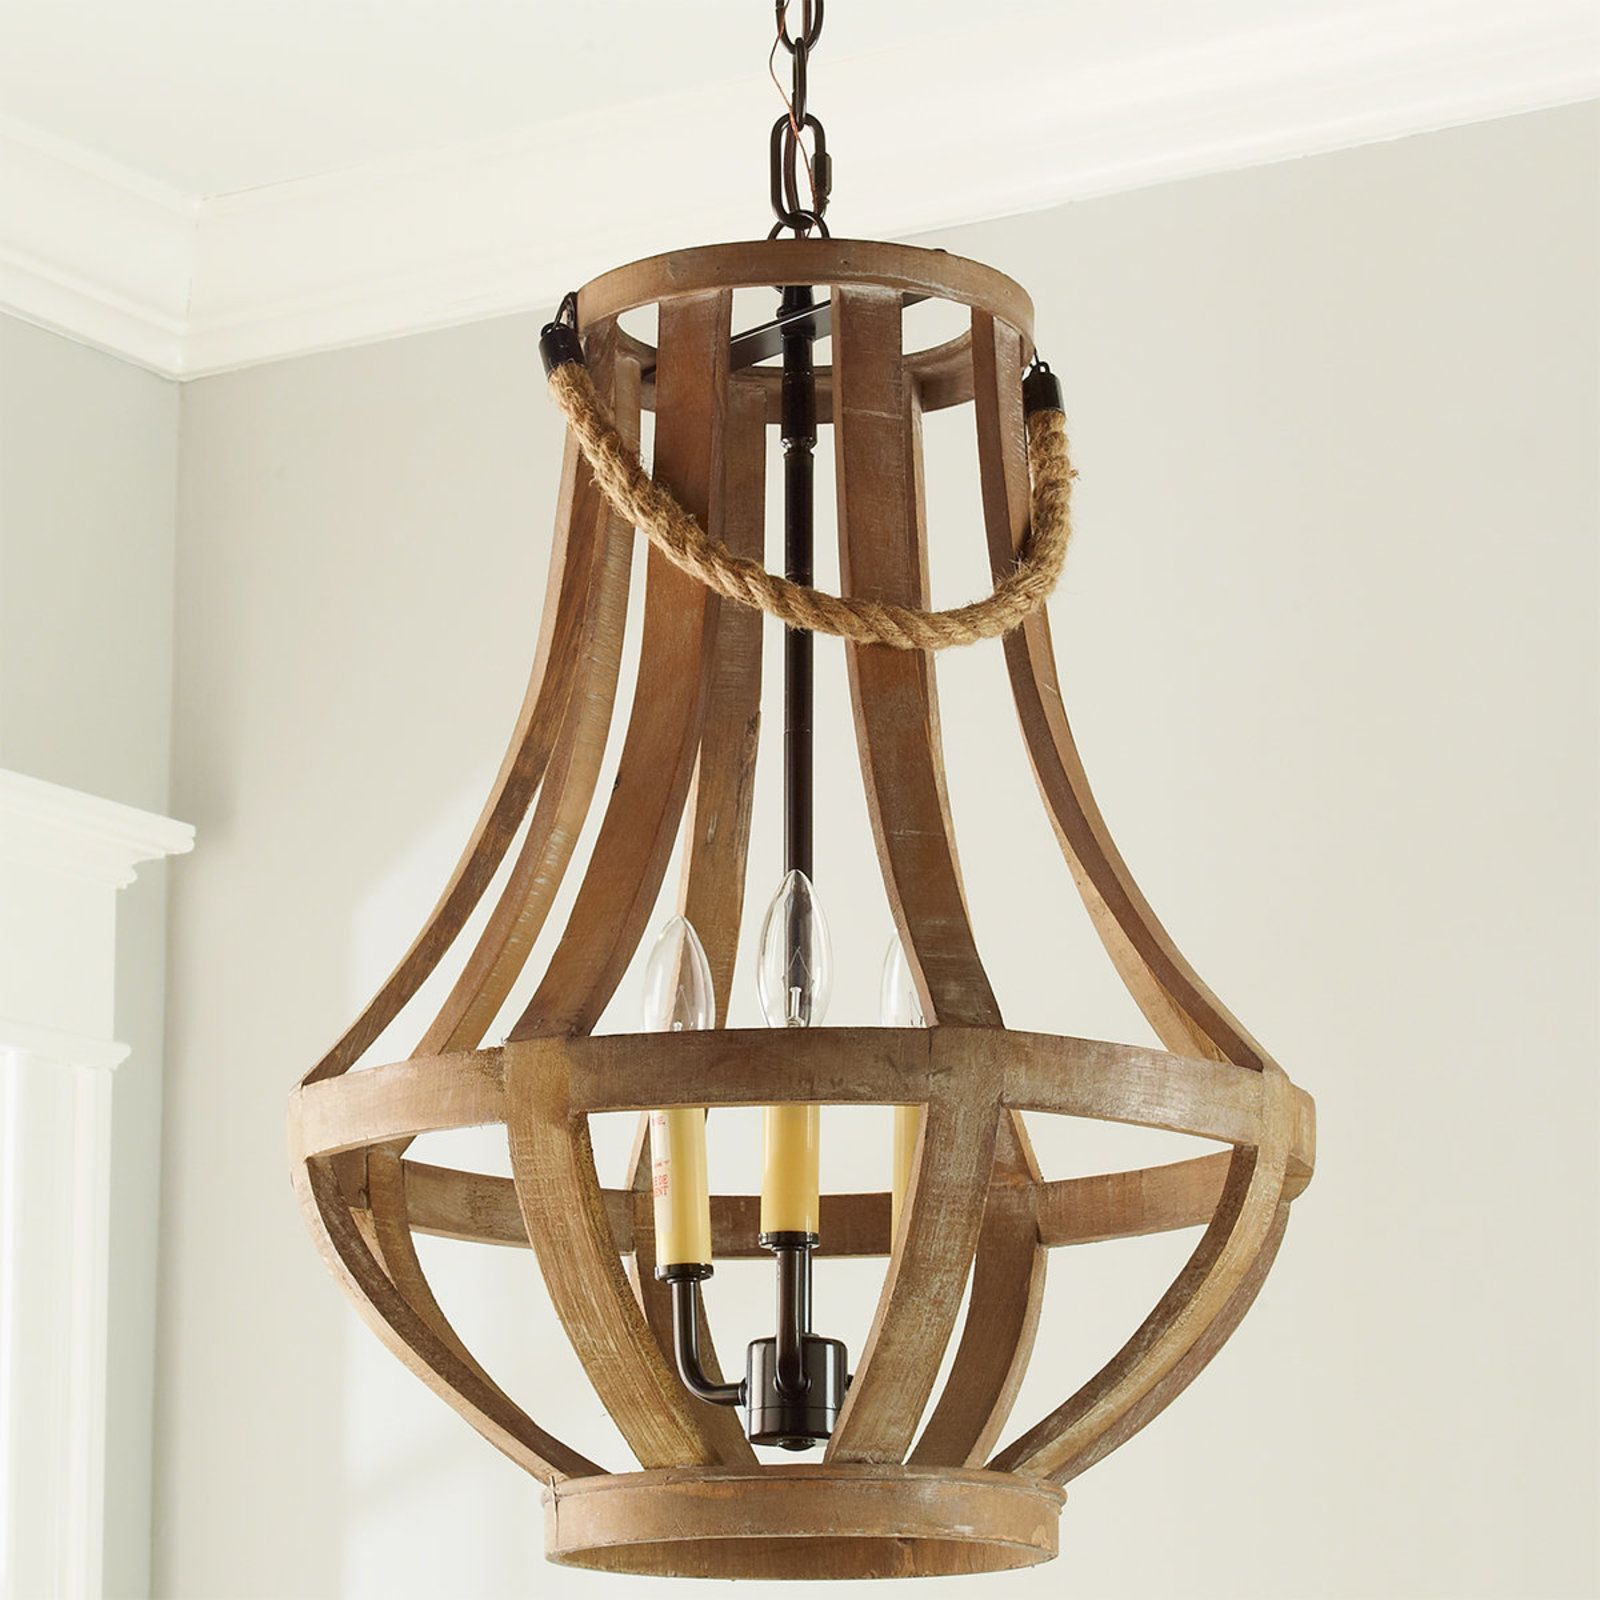 Napa distressed wood chandelier bronze wood master